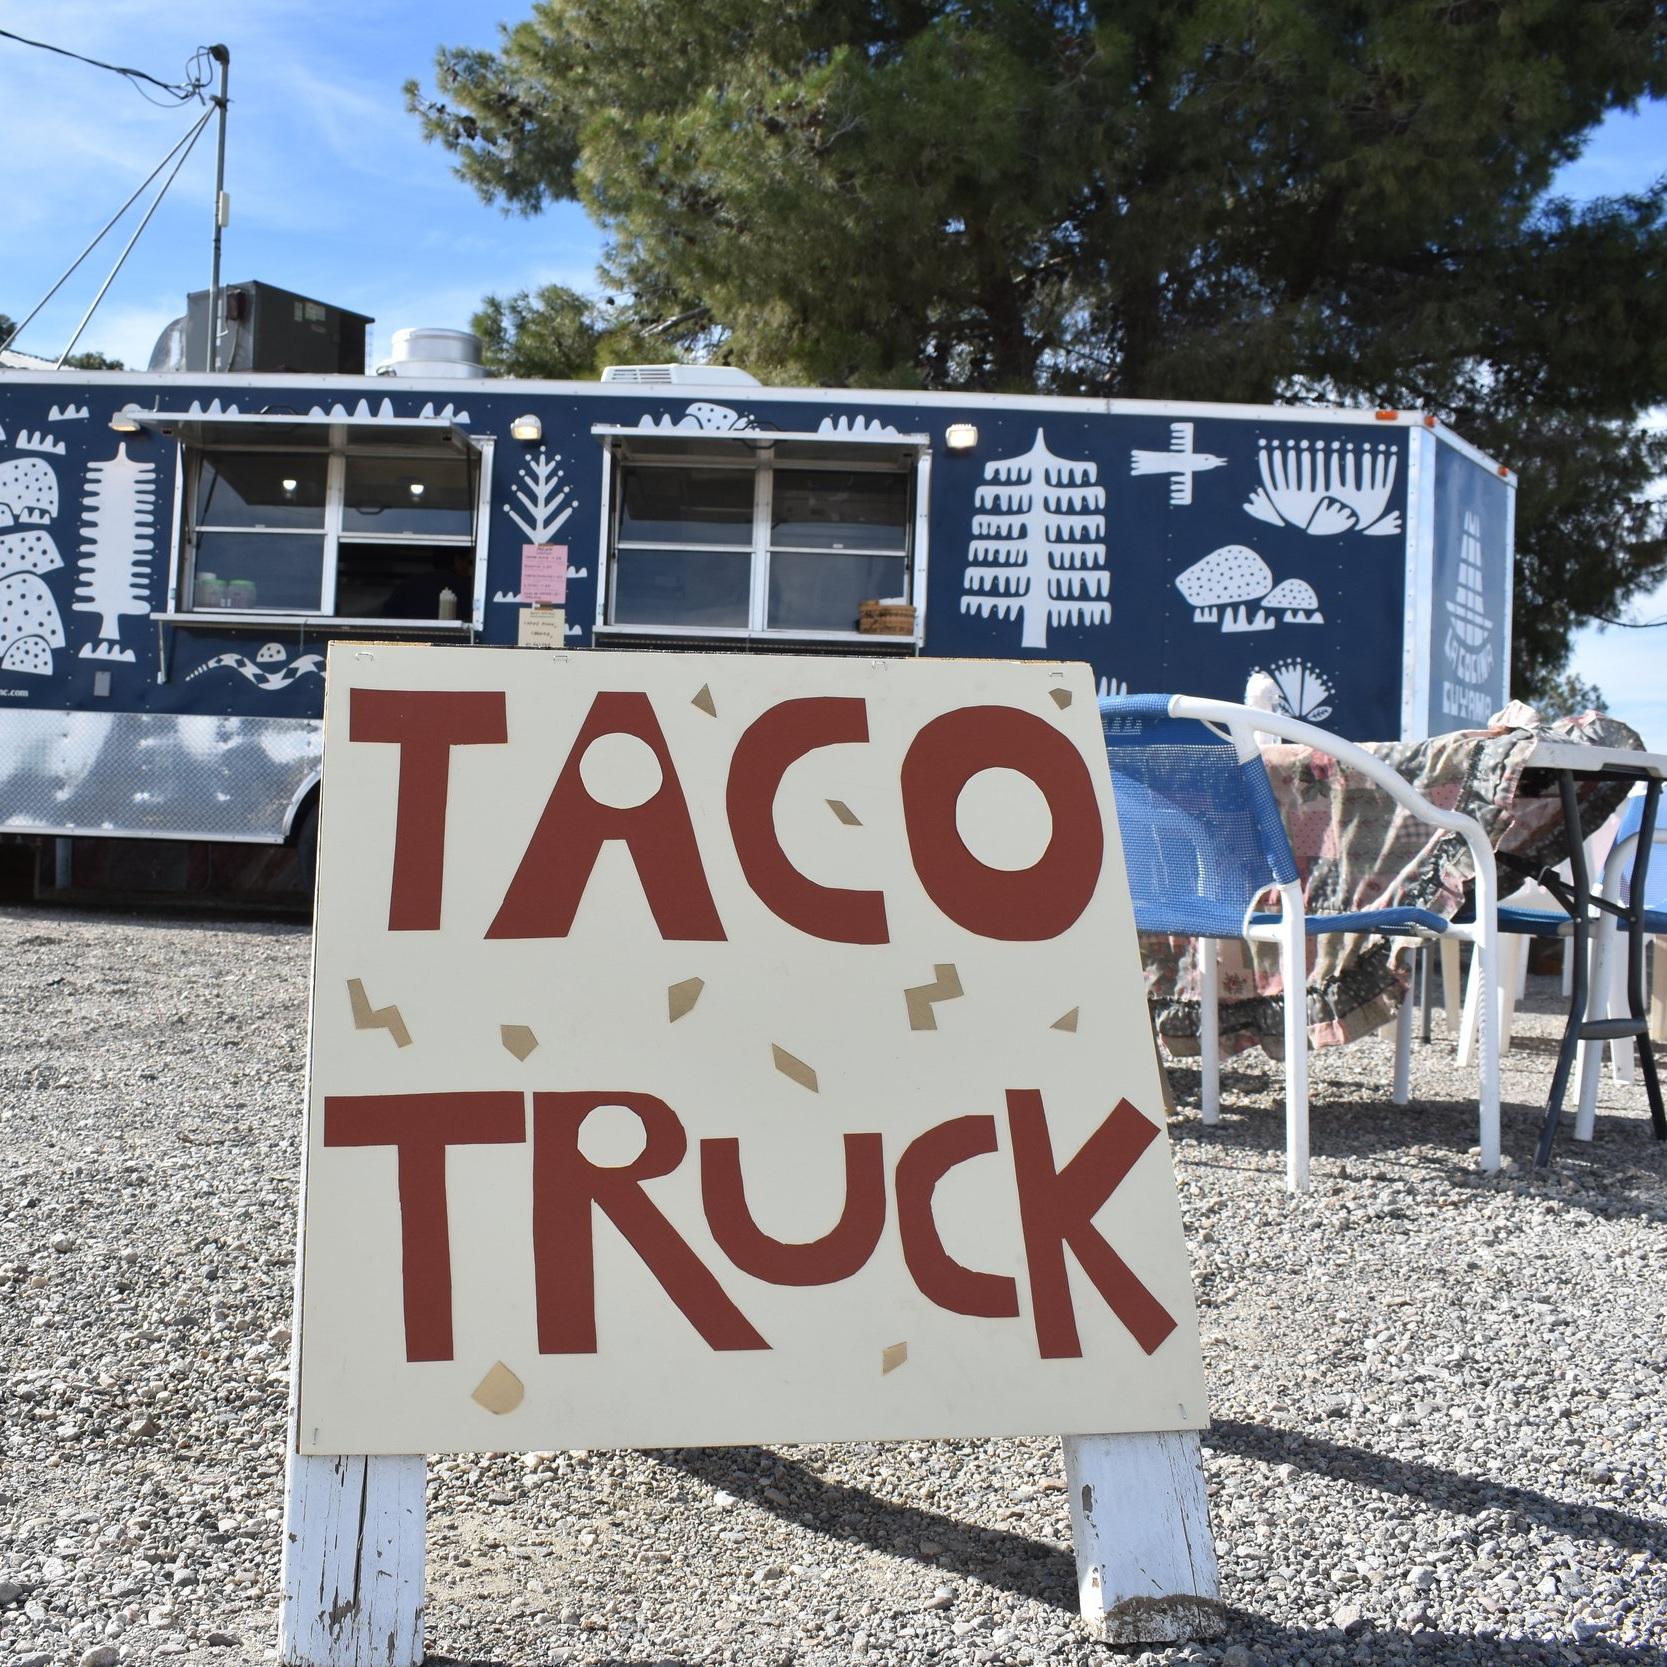 Cuyama Taco Truck January 28, 2019 (12PM - 5PM)